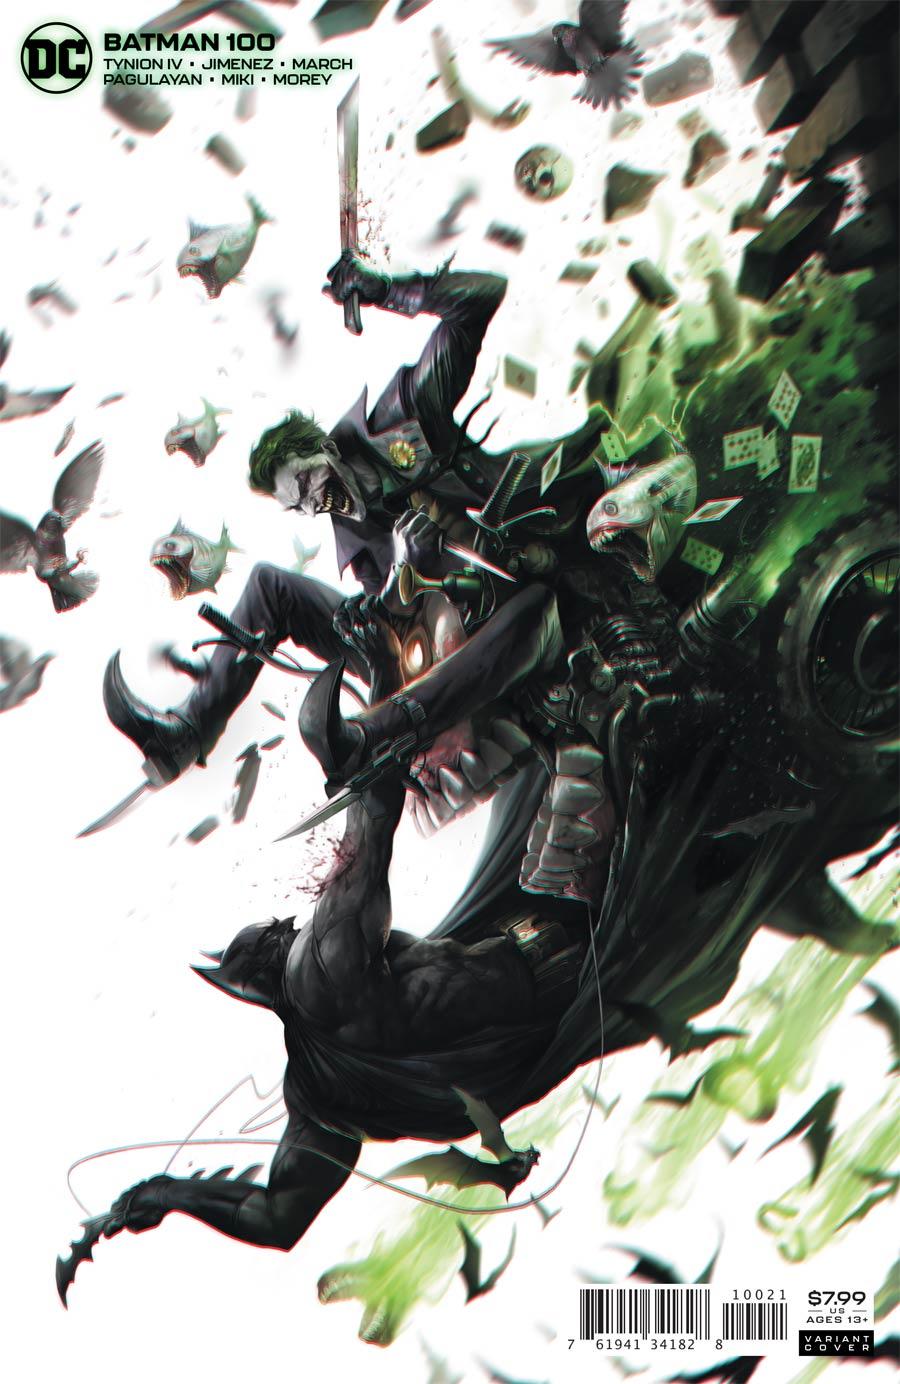 Batman Vol 3 #100 Cover B Variant Francesco Mattina Card Stock Cover (Joker War Tie-In)